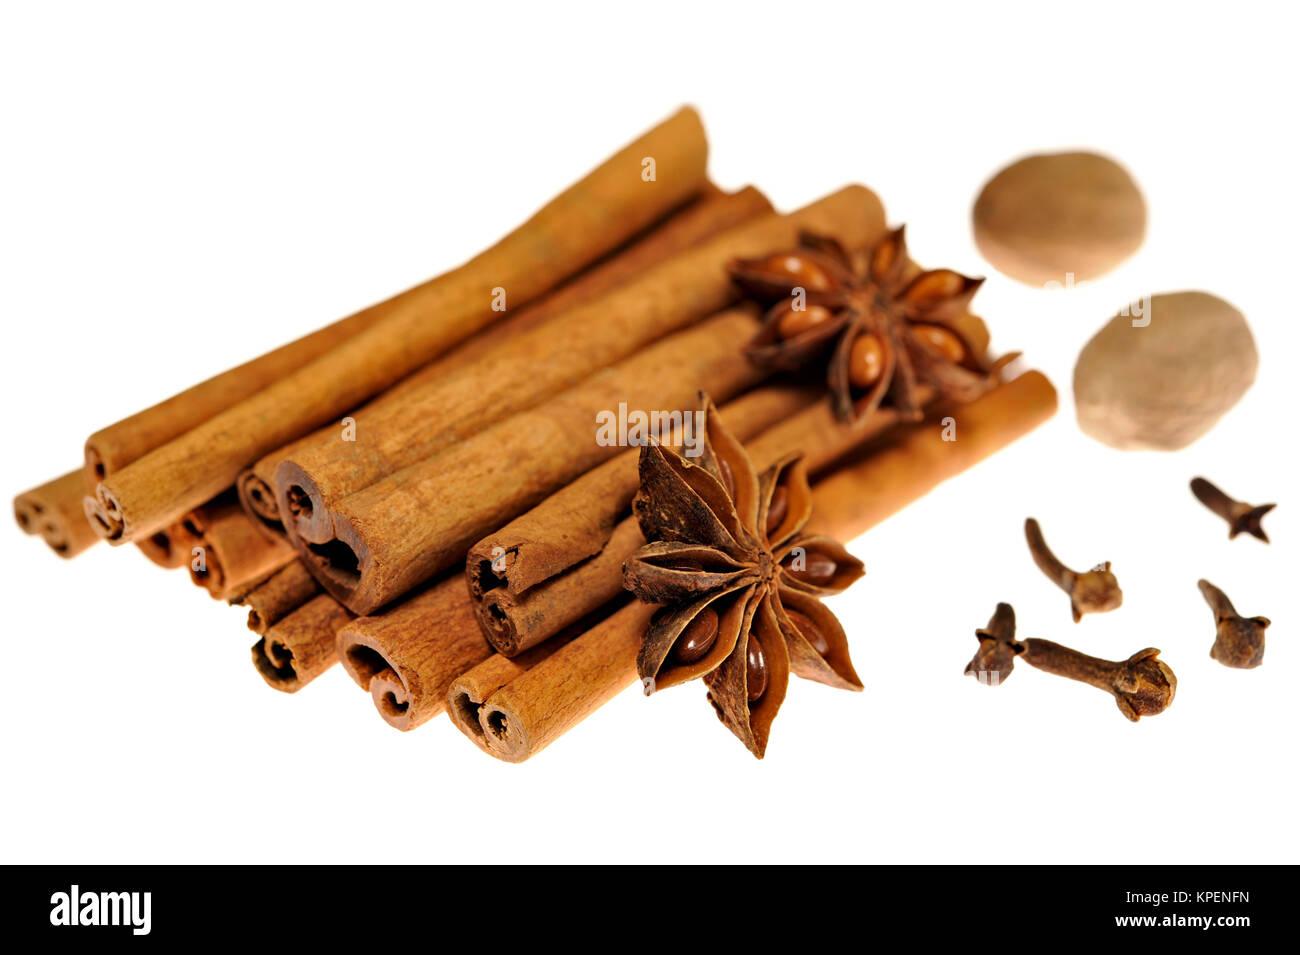 Anise star on cinnamon sticks - Stock Image